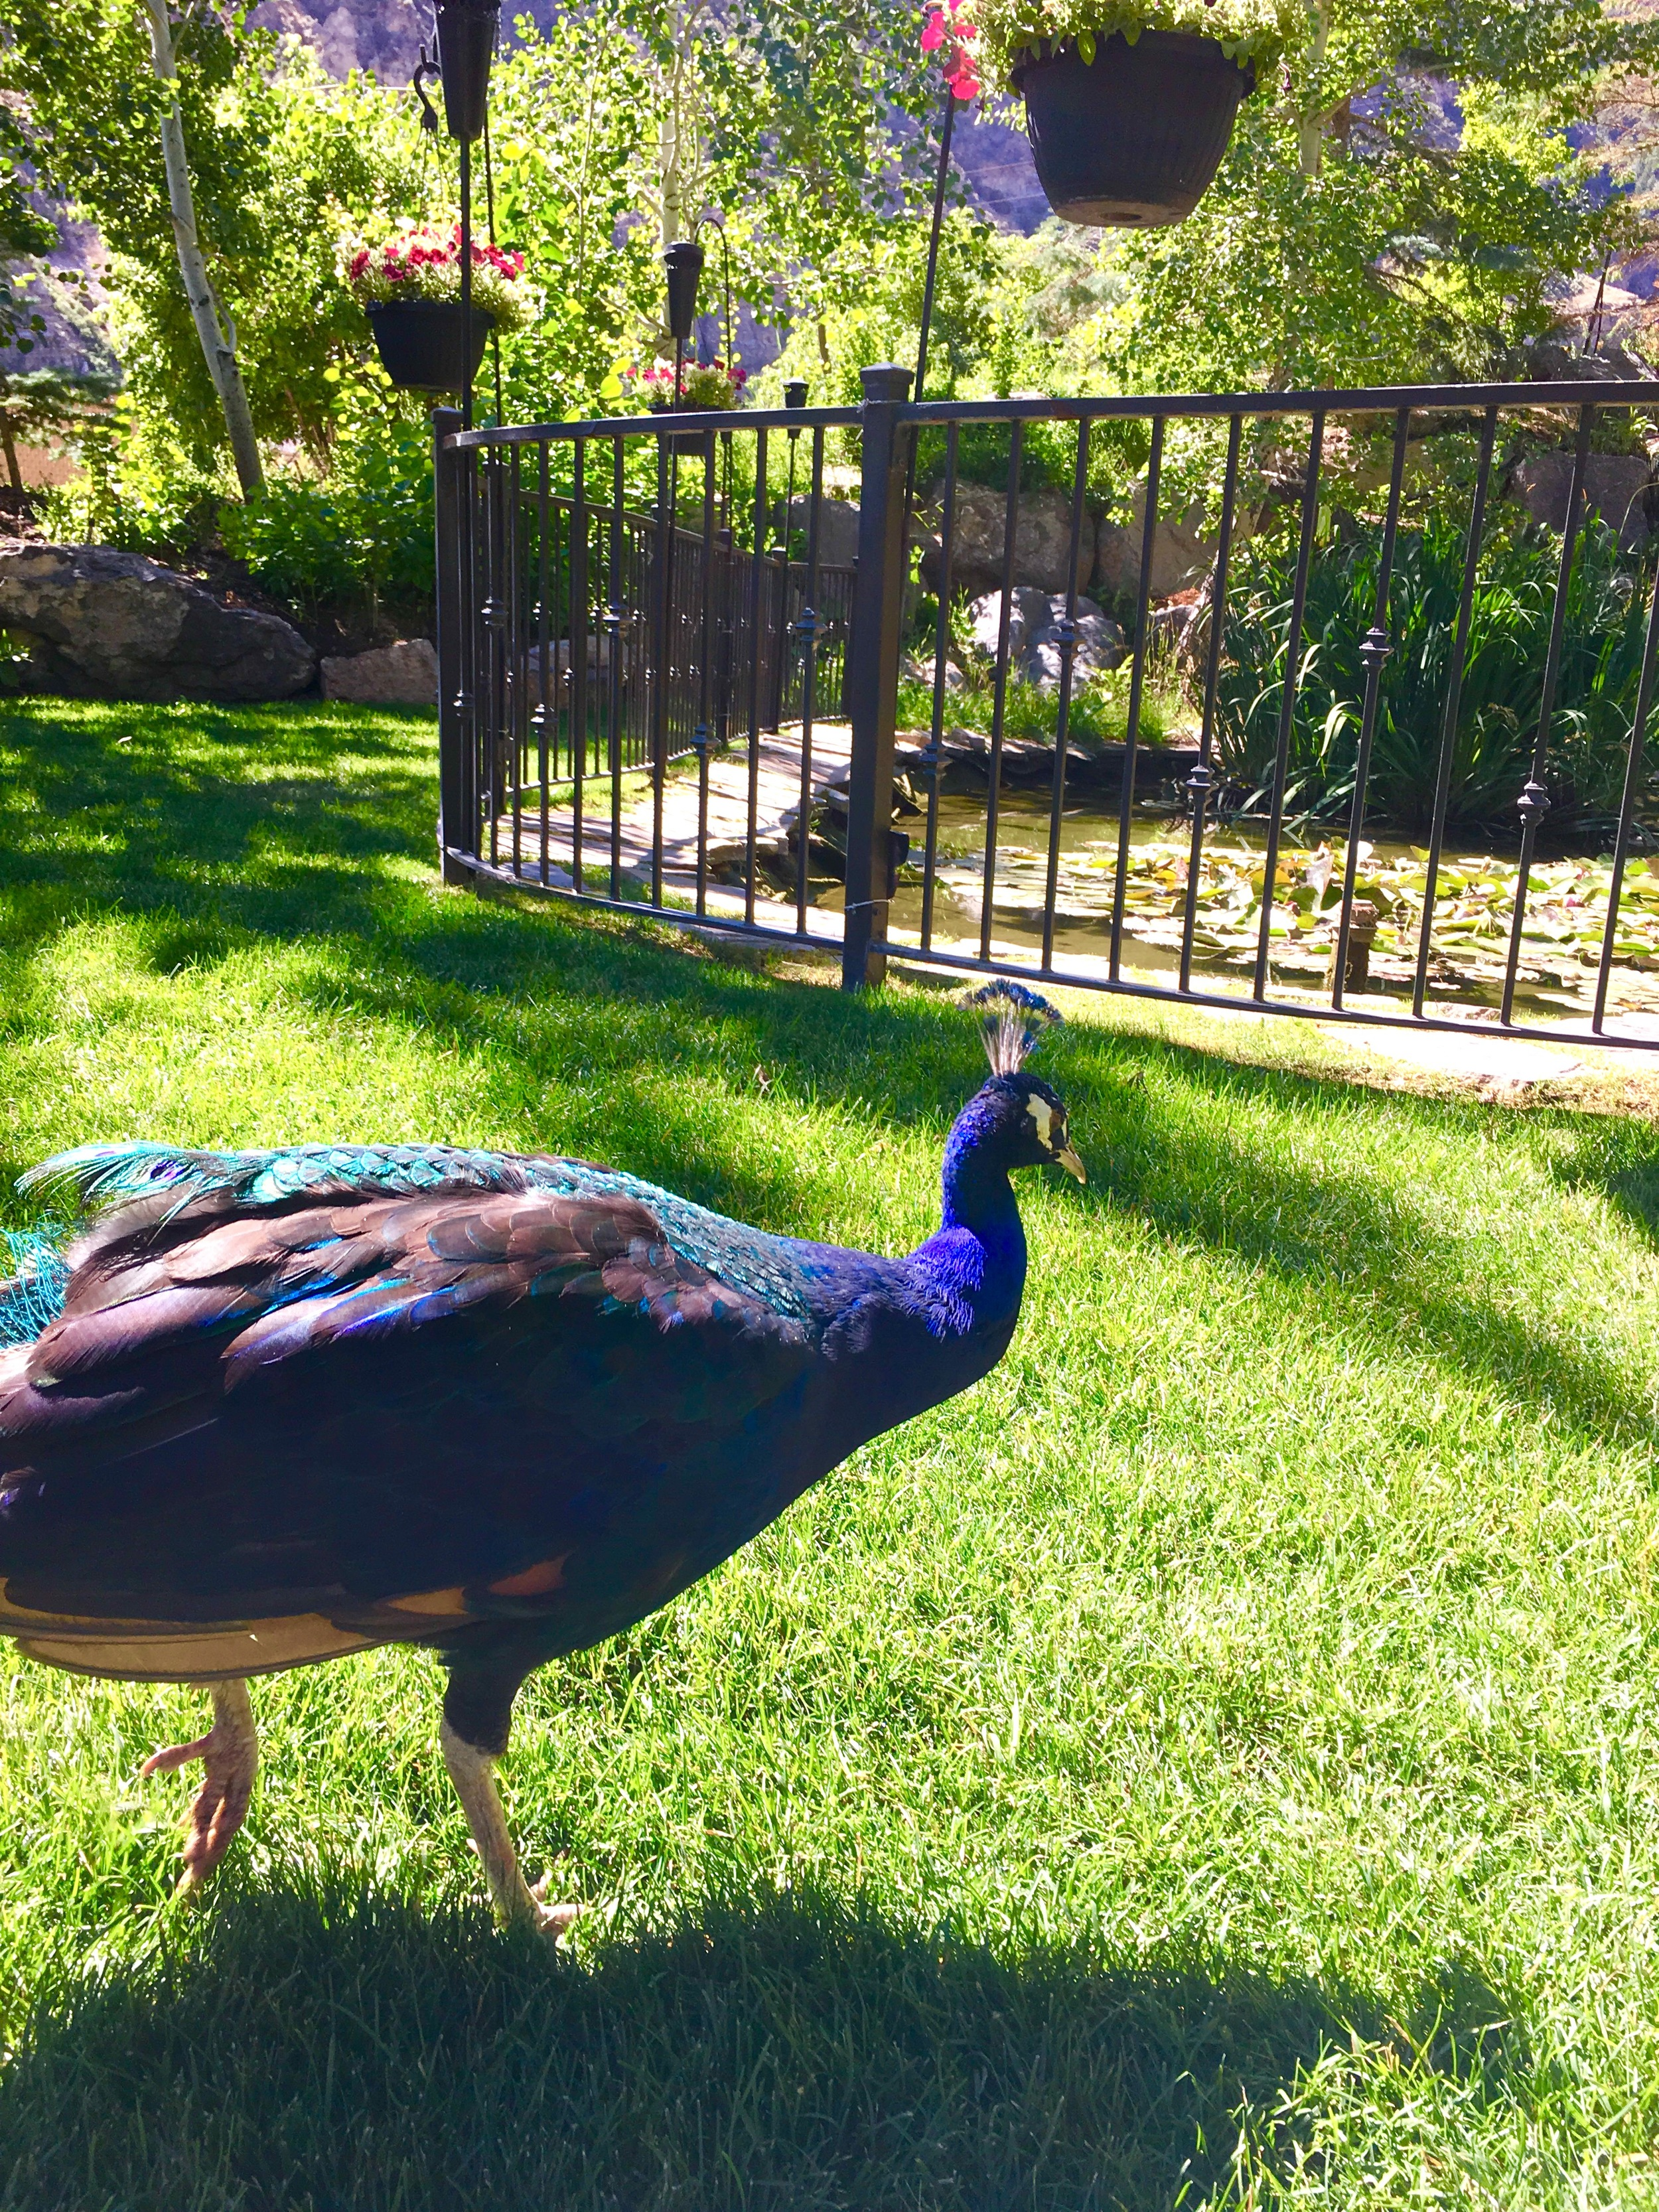 Princeton the Peacock